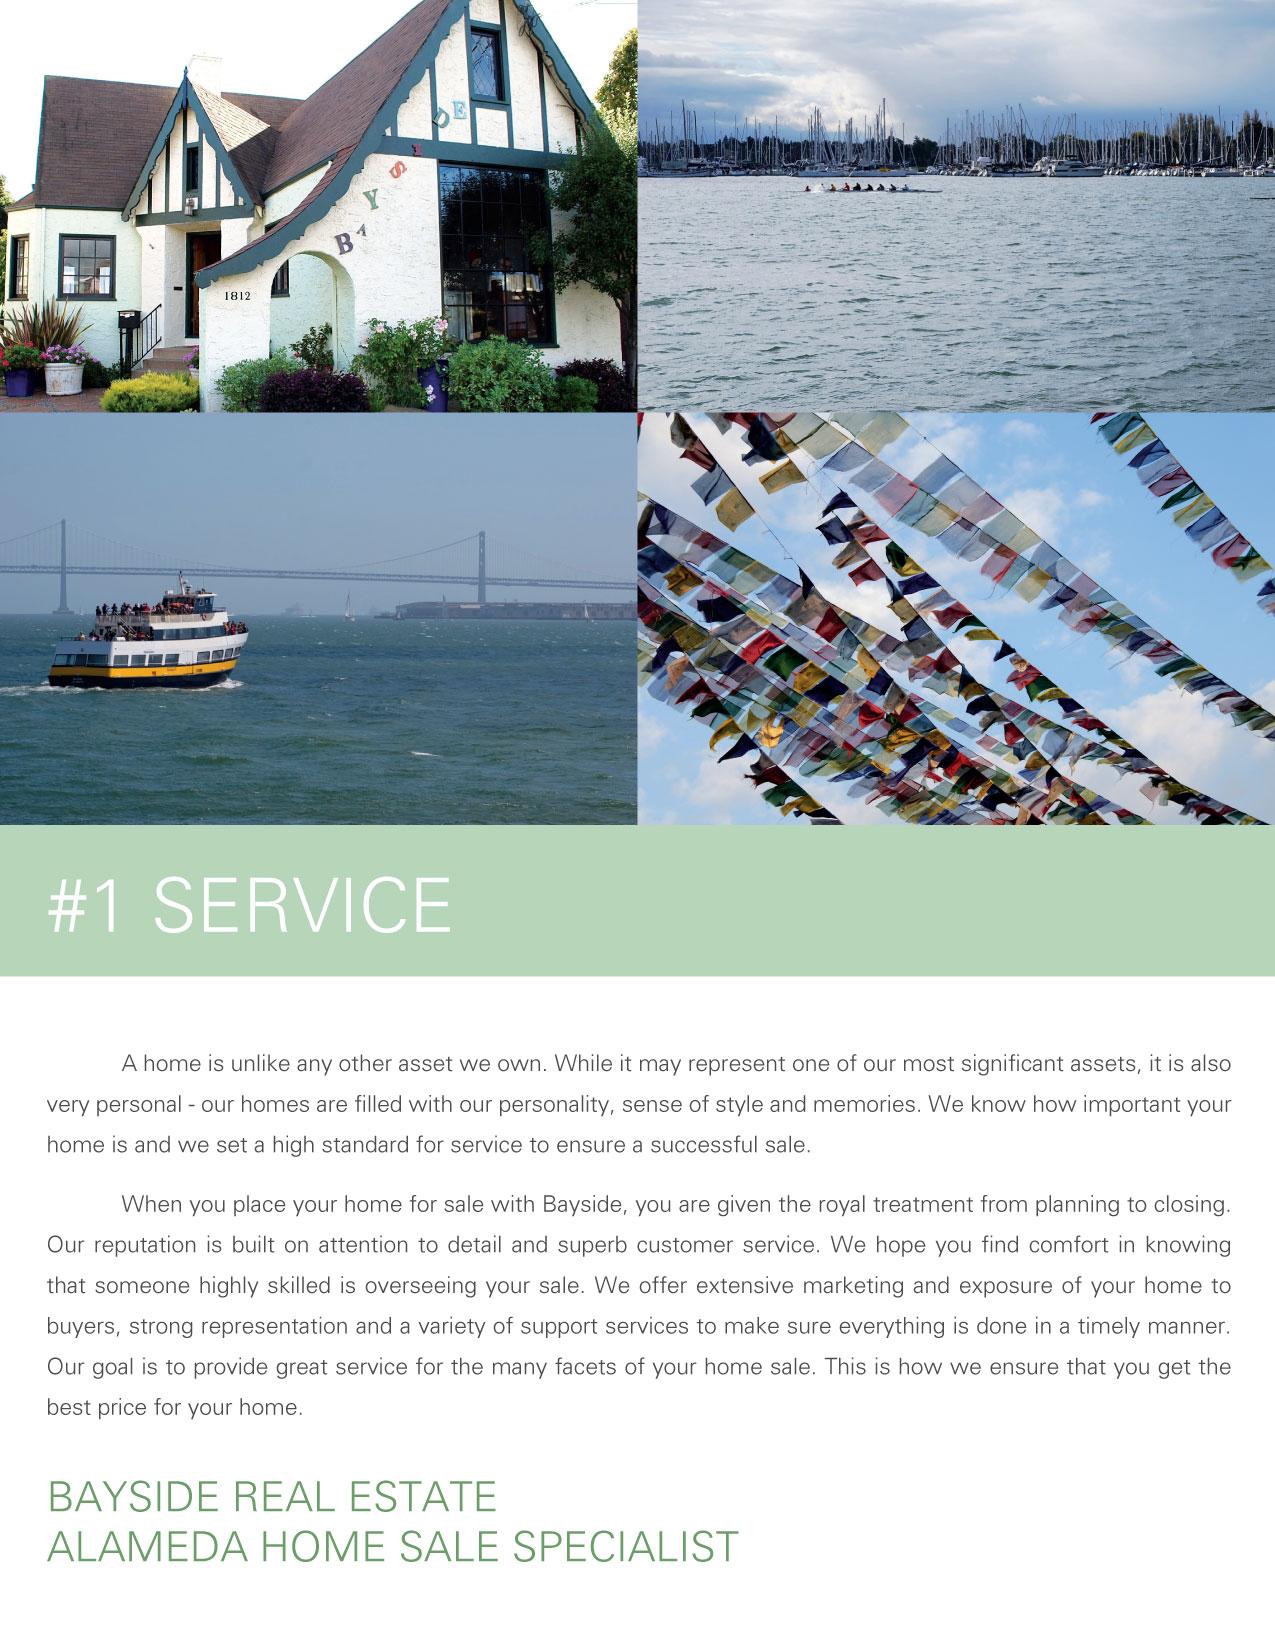 Listing Presentation - #1 Service